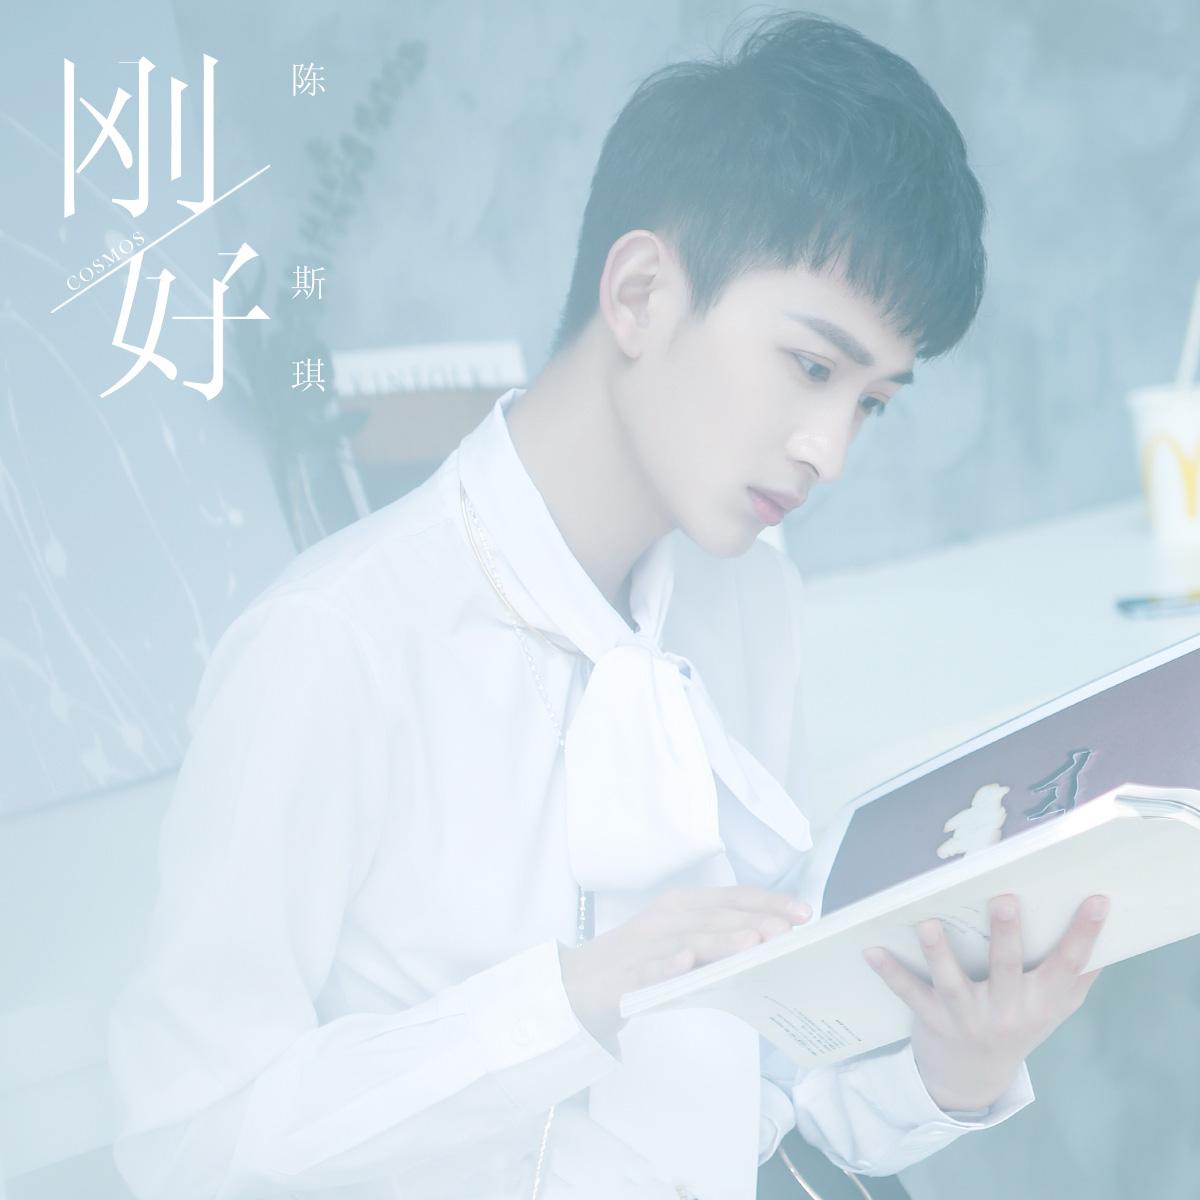 Chen Si Qi